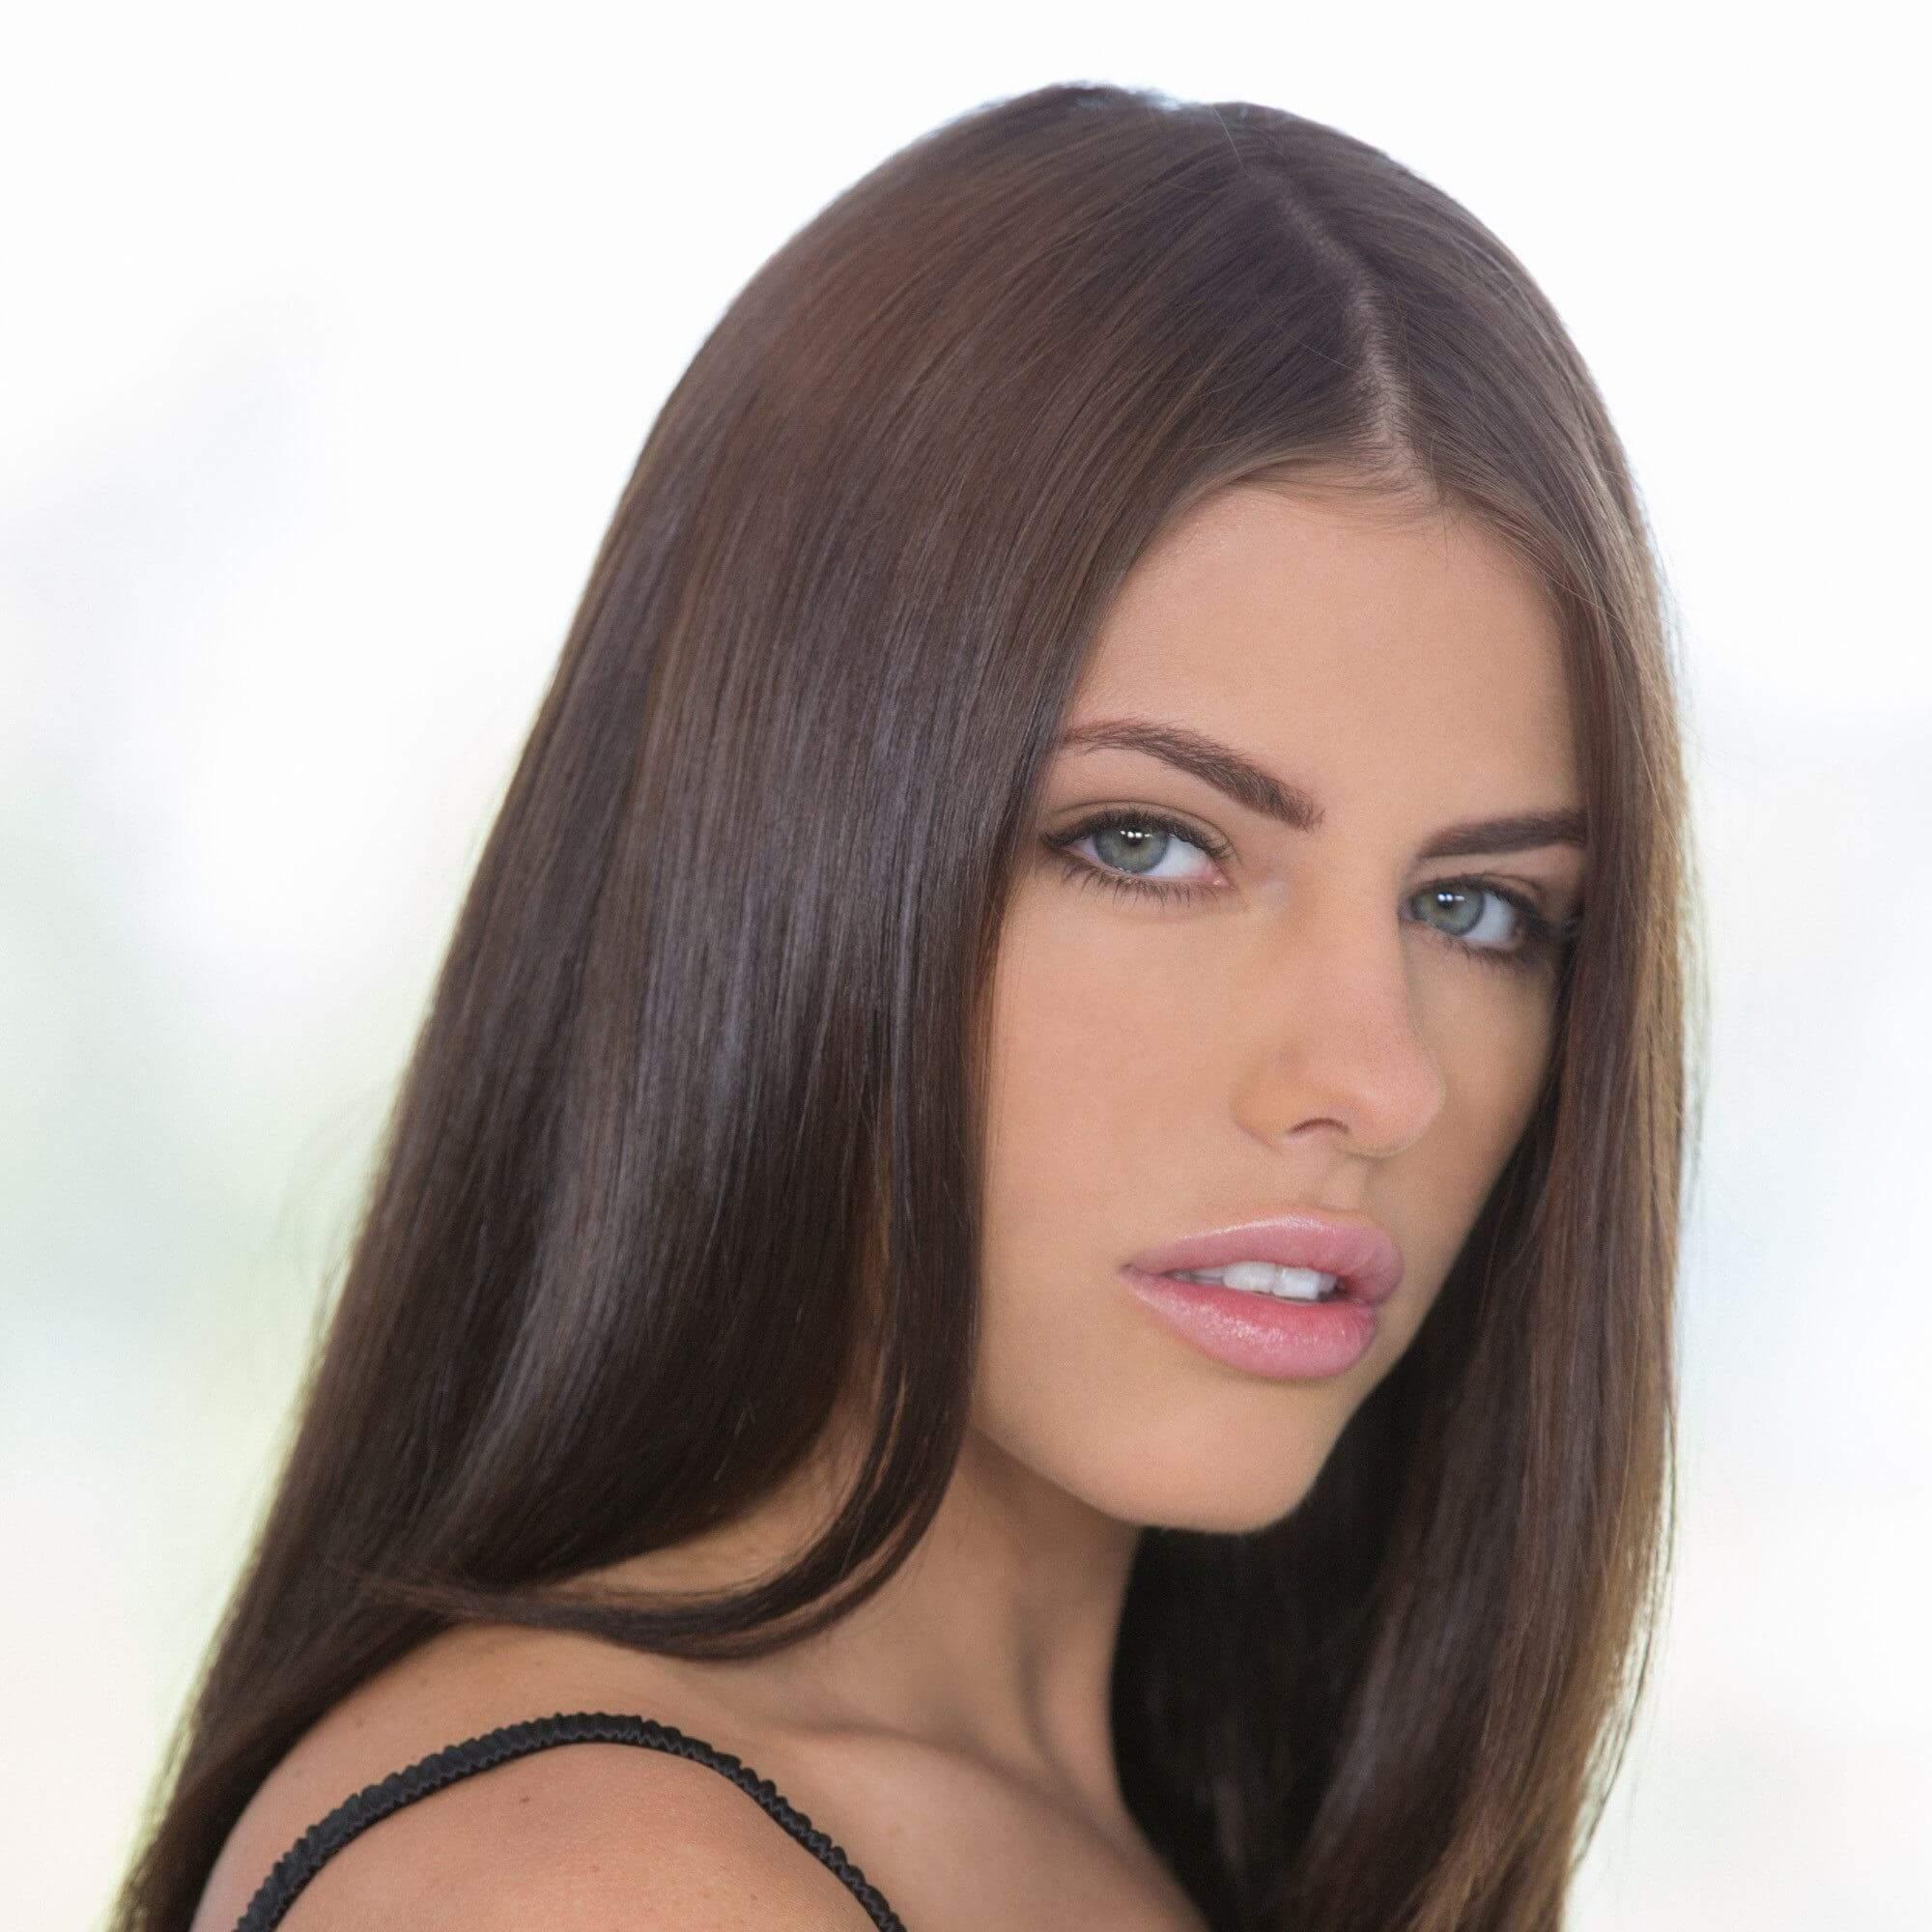 Adriana checkchik